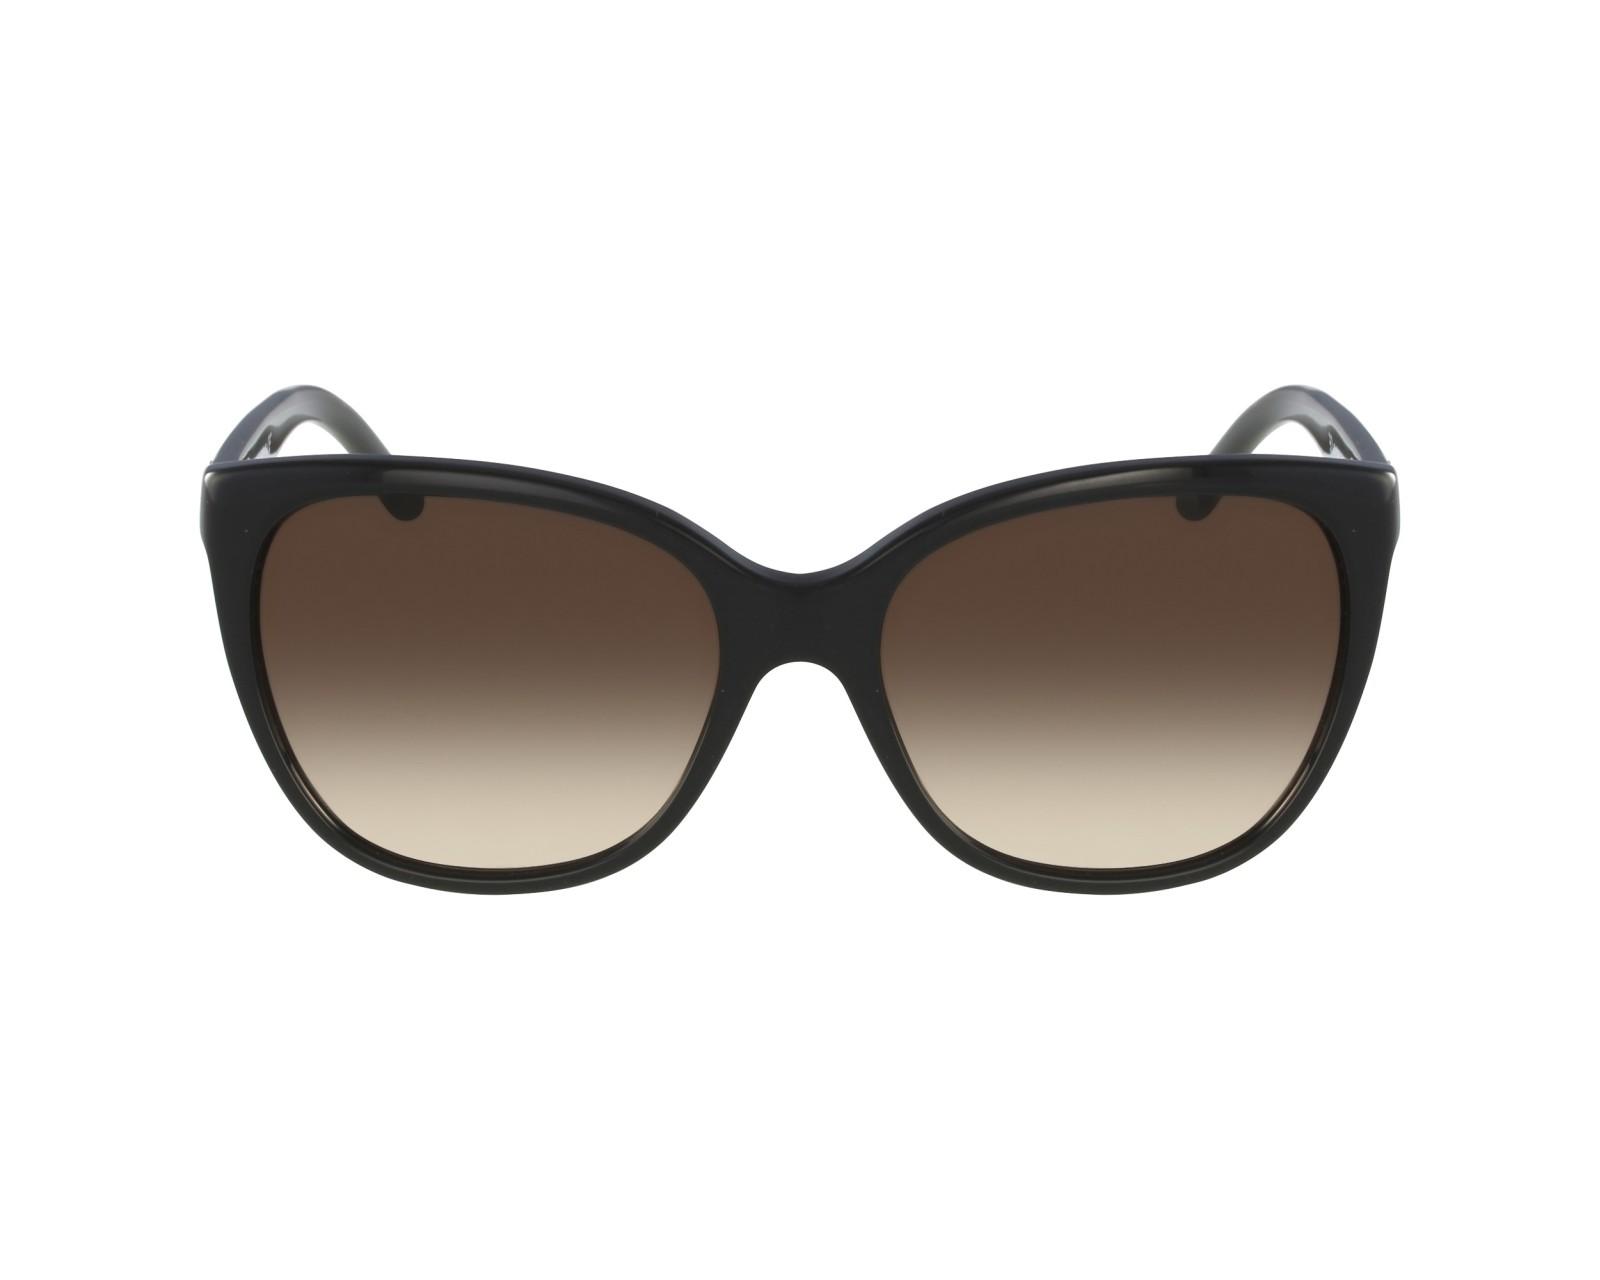 acheter des lunettes de soleil versace ve 4281 gb1 13 visionet. Black Bedroom Furniture Sets. Home Design Ideas